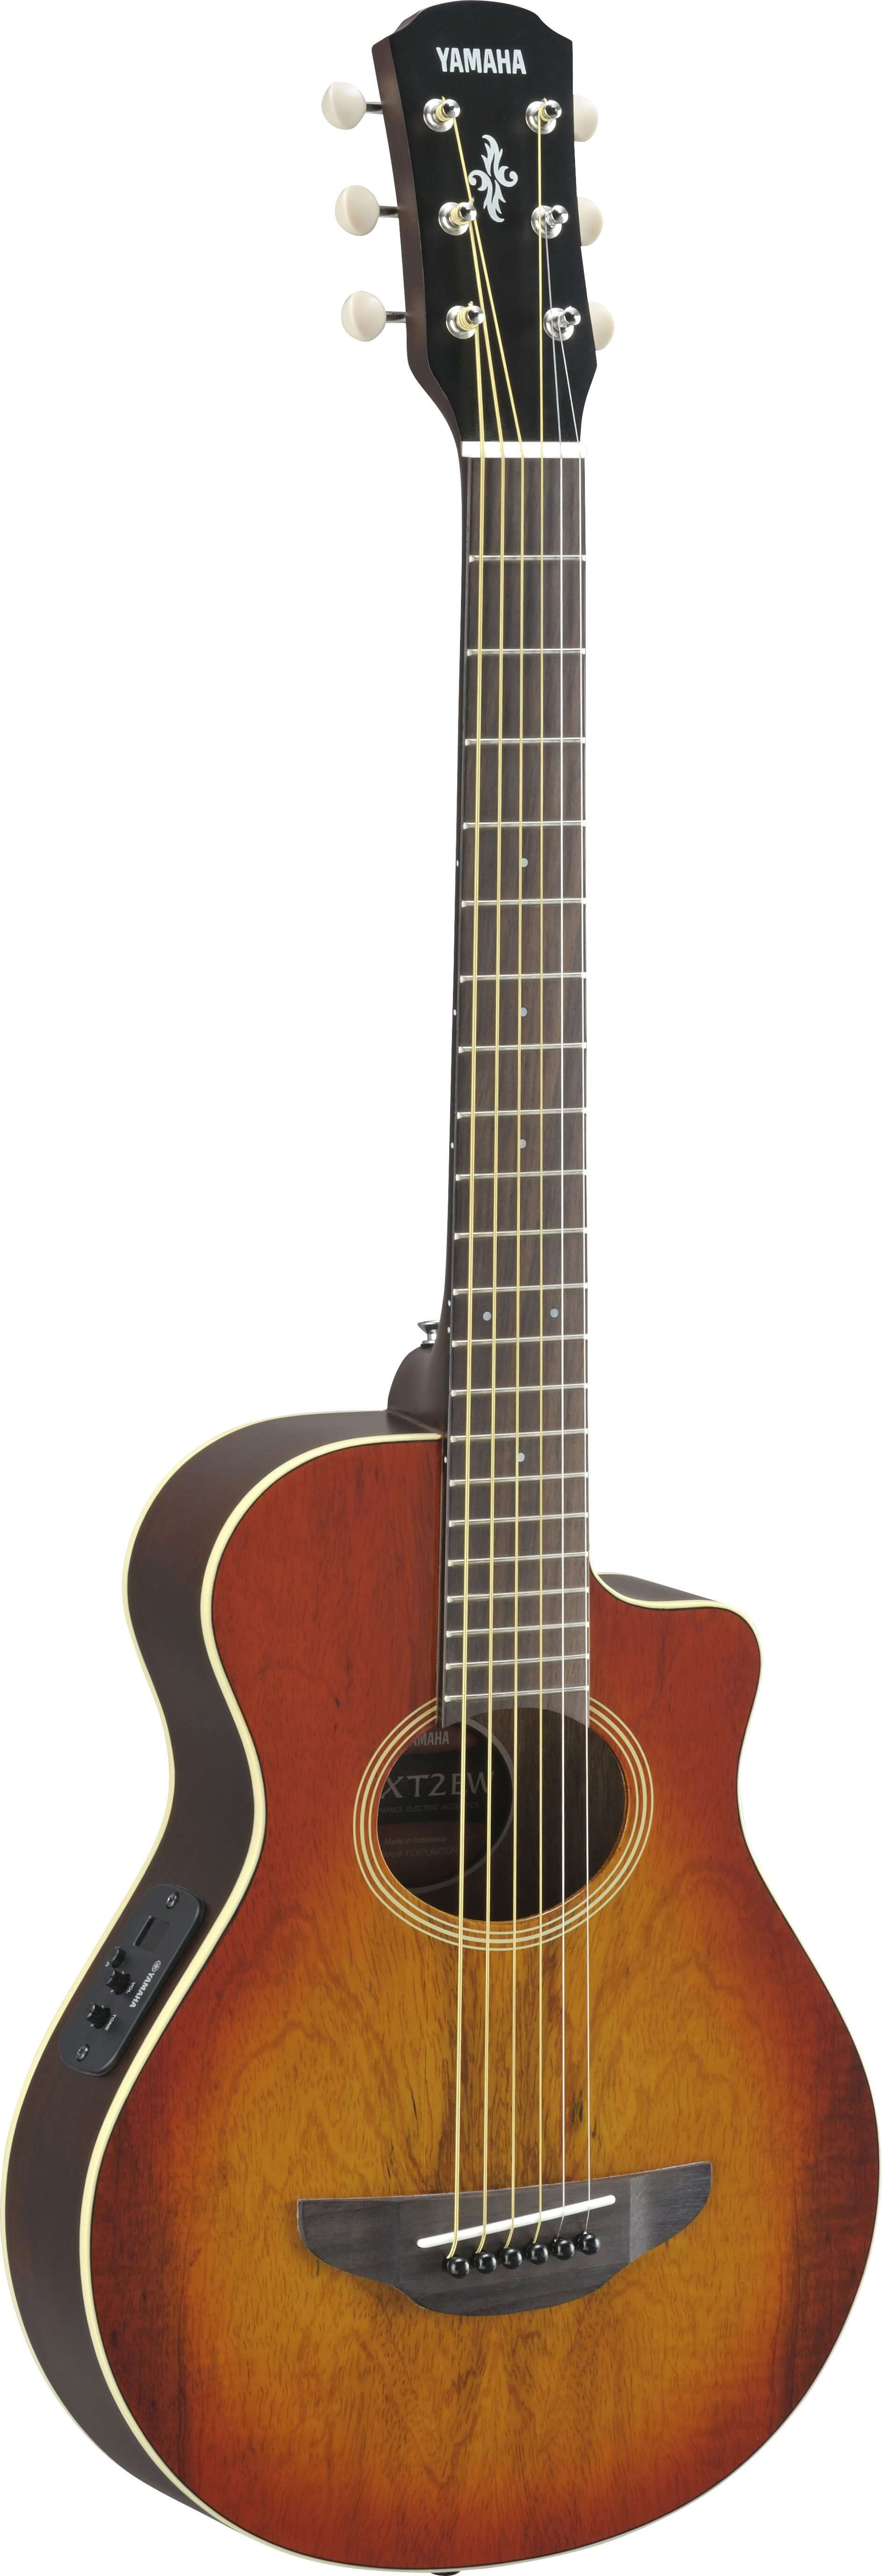 Guitarra Electroacústica Yamaha APX T2 EW